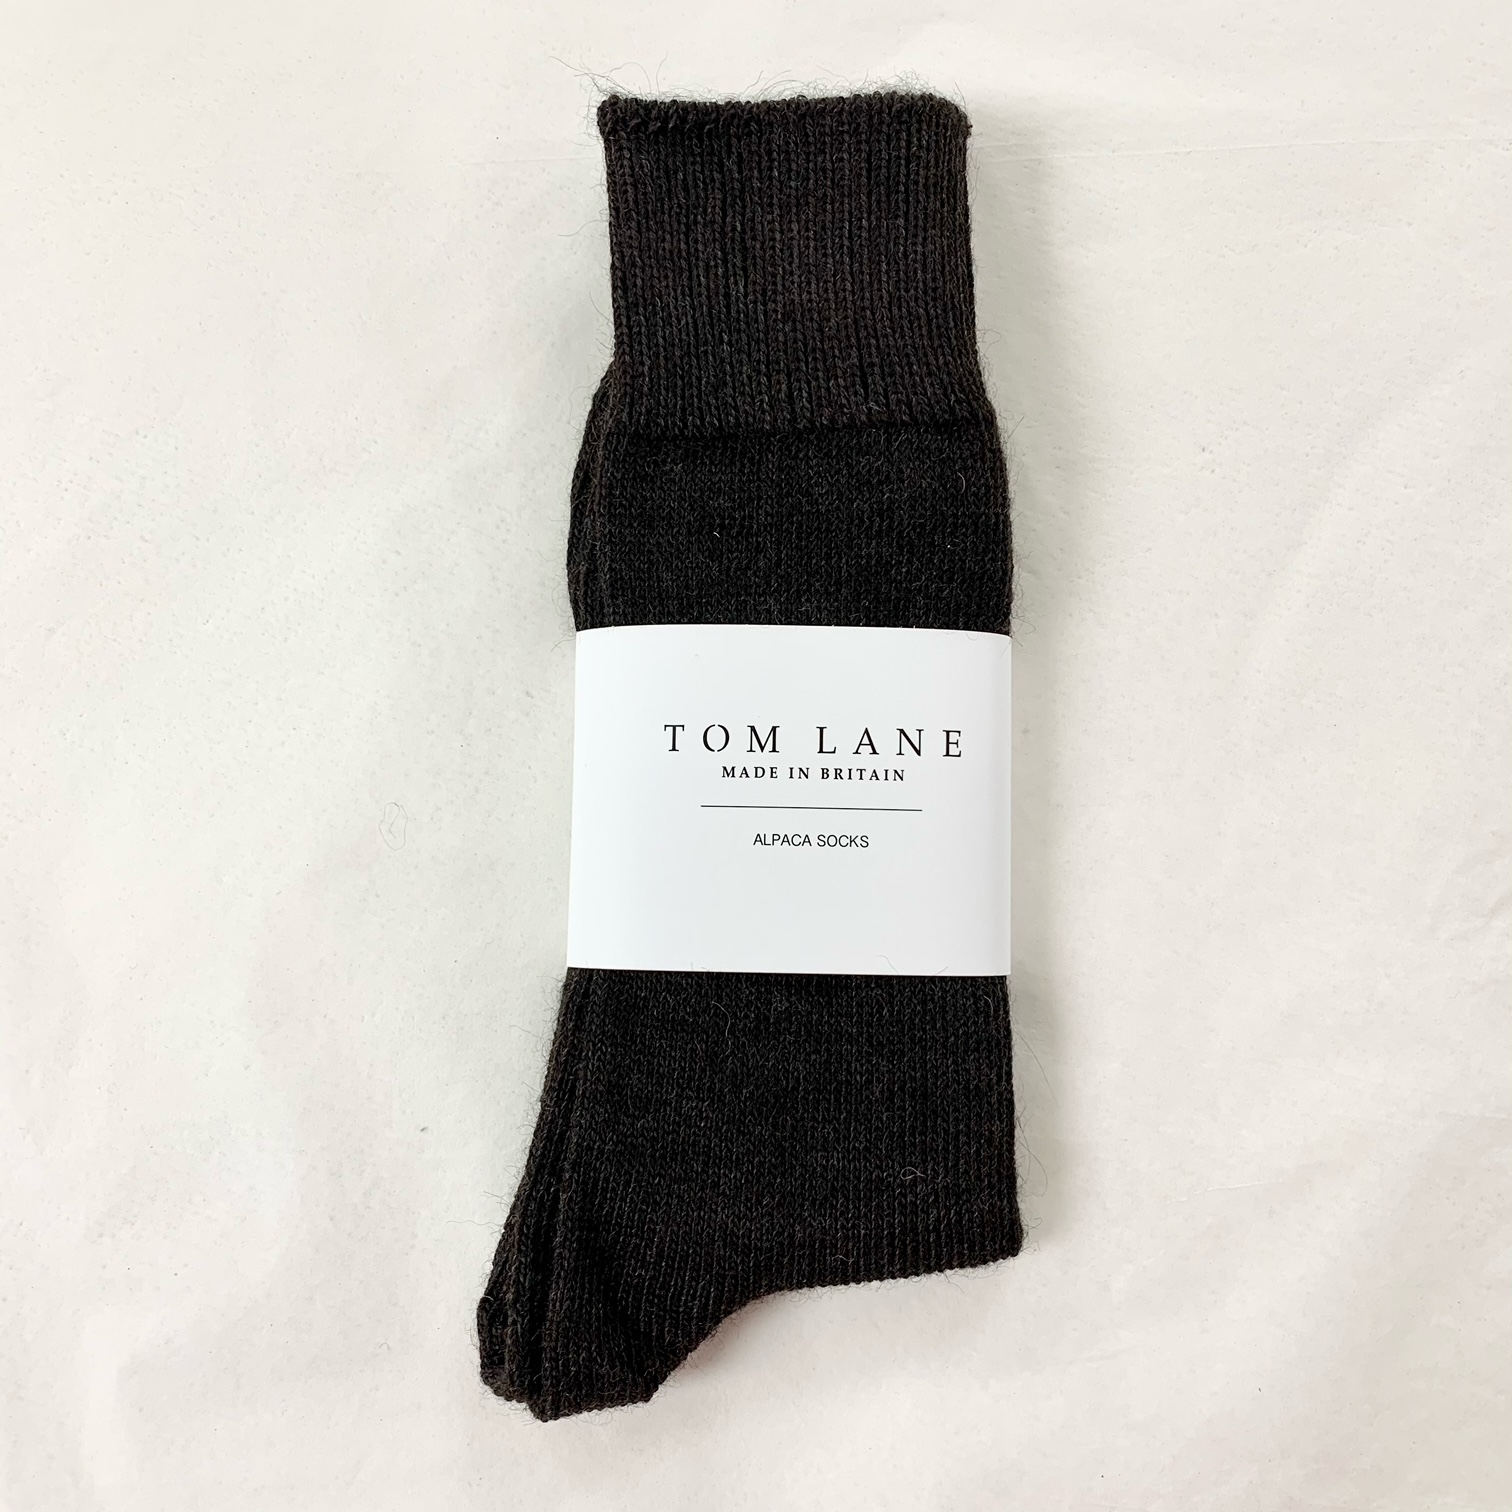 Unisex Alpaca Socks Charcoal